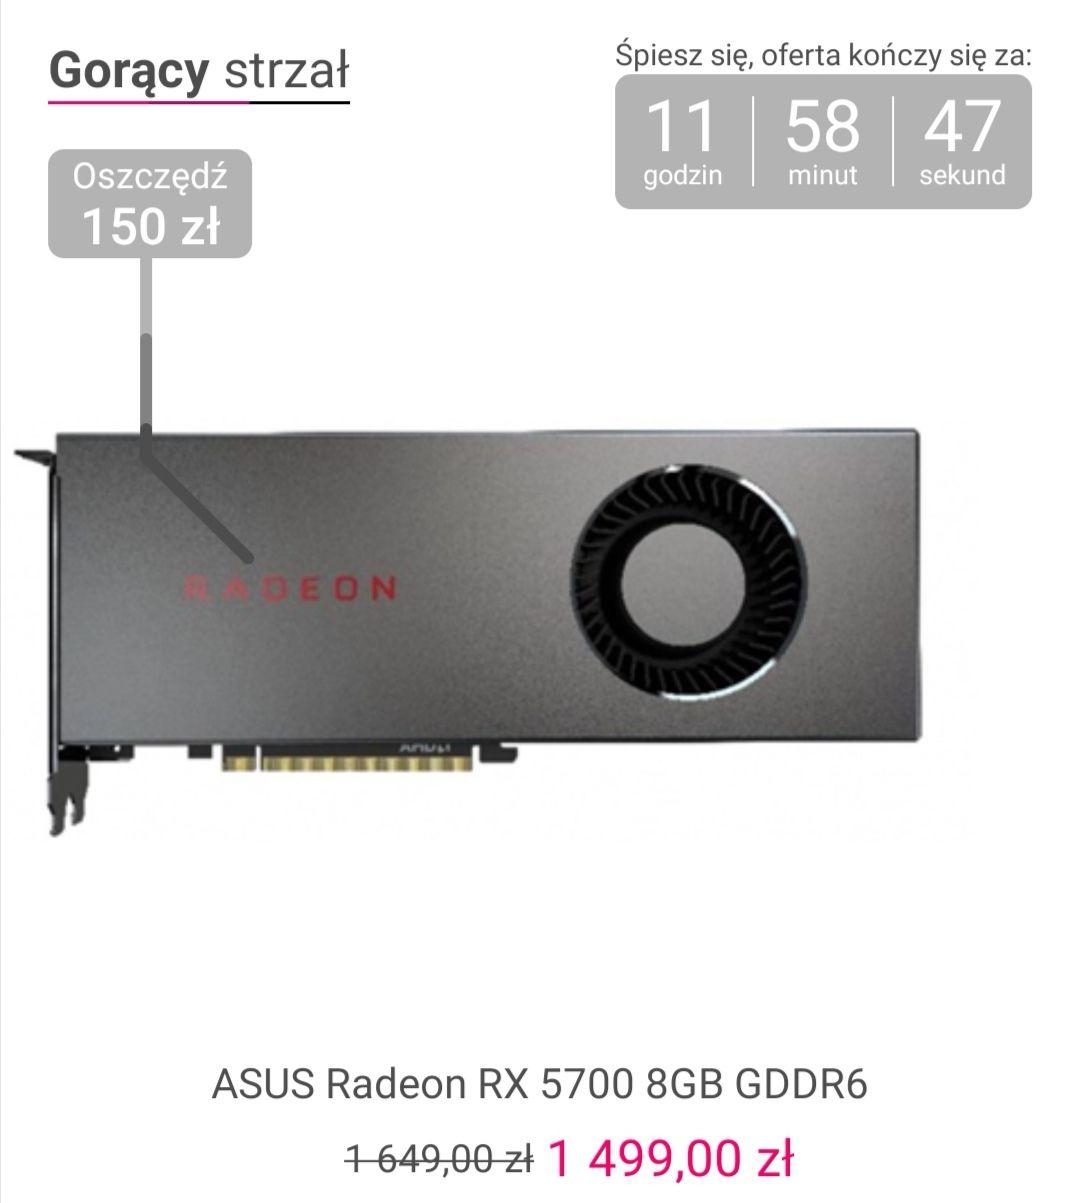 Karta graficzna ASUS Radeon RX 5700